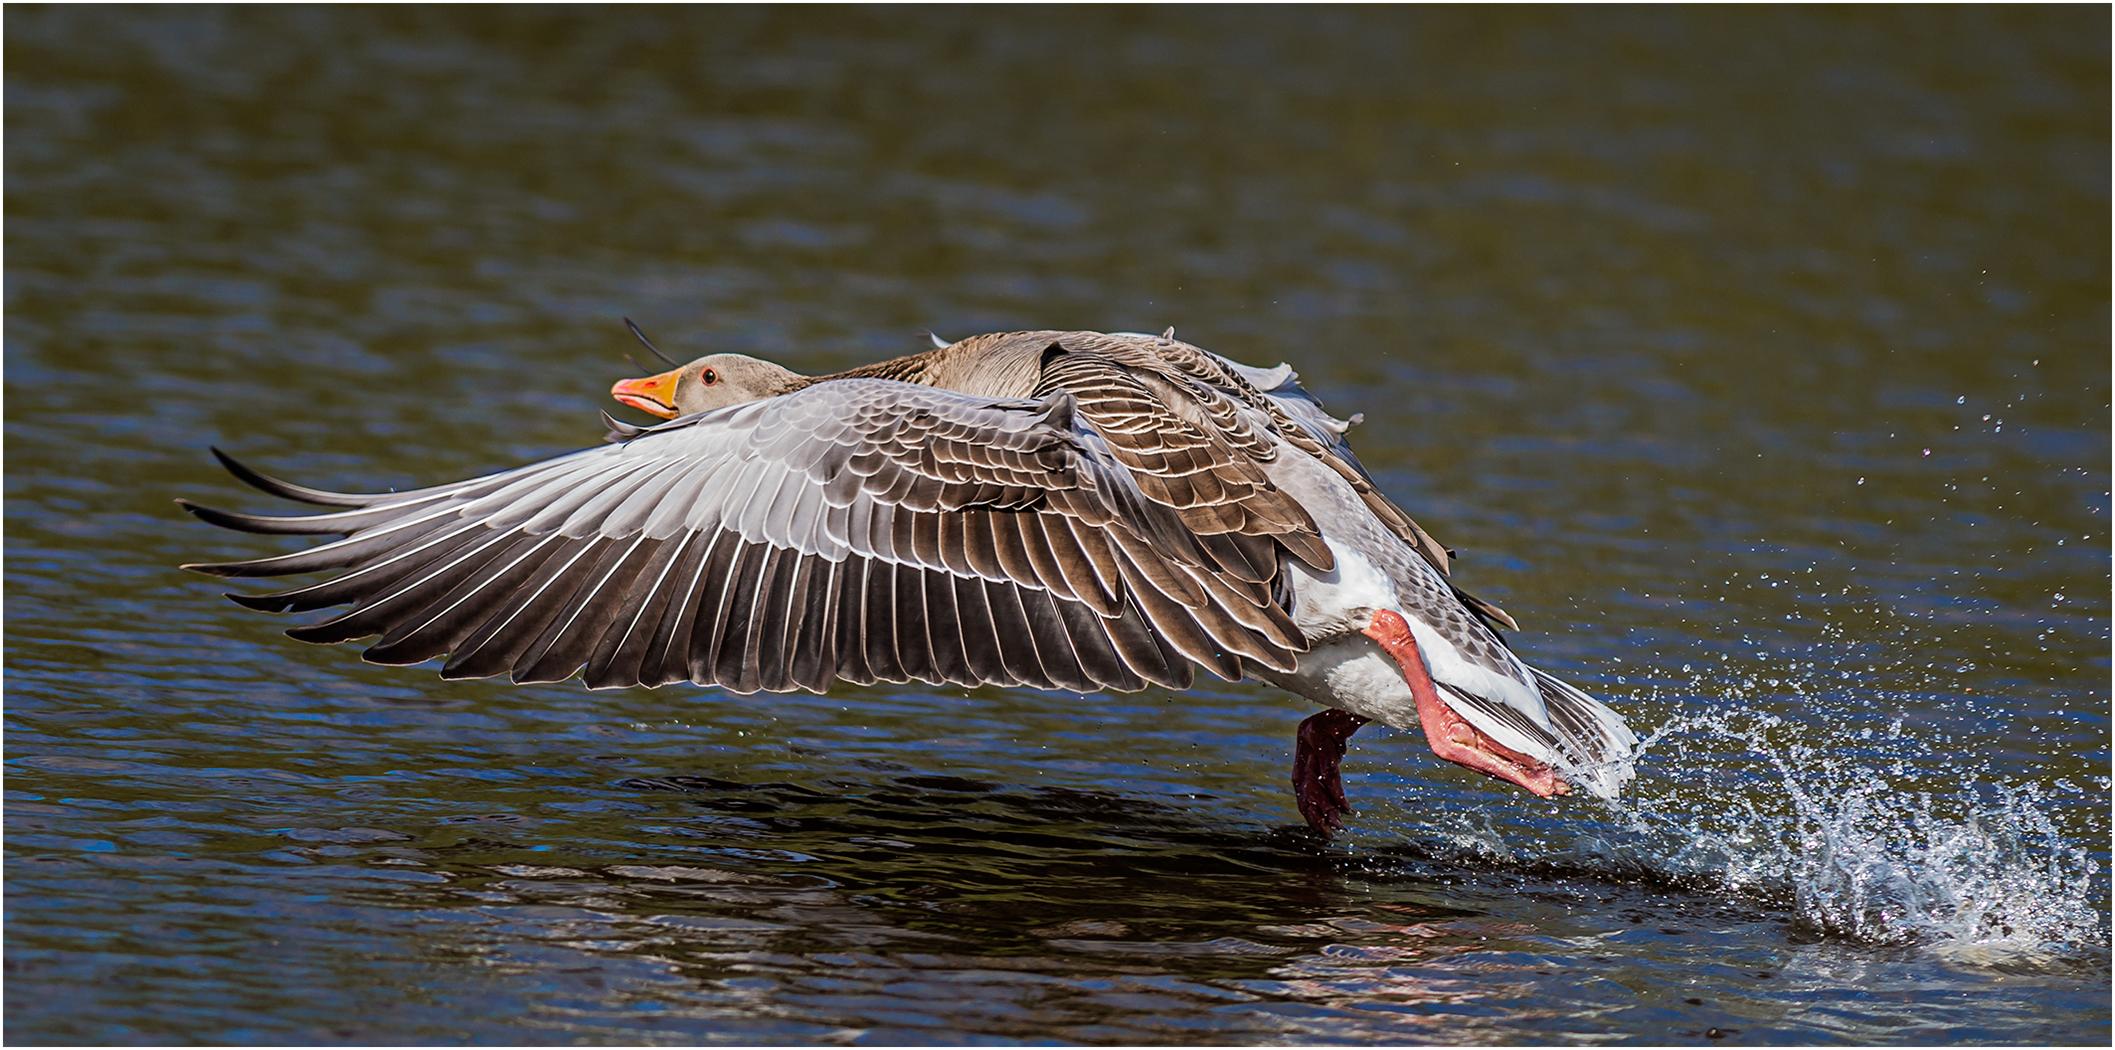 4_Highly Commended_Graylag Goose Take Off_BrendanHinds_CBPPU.jpg